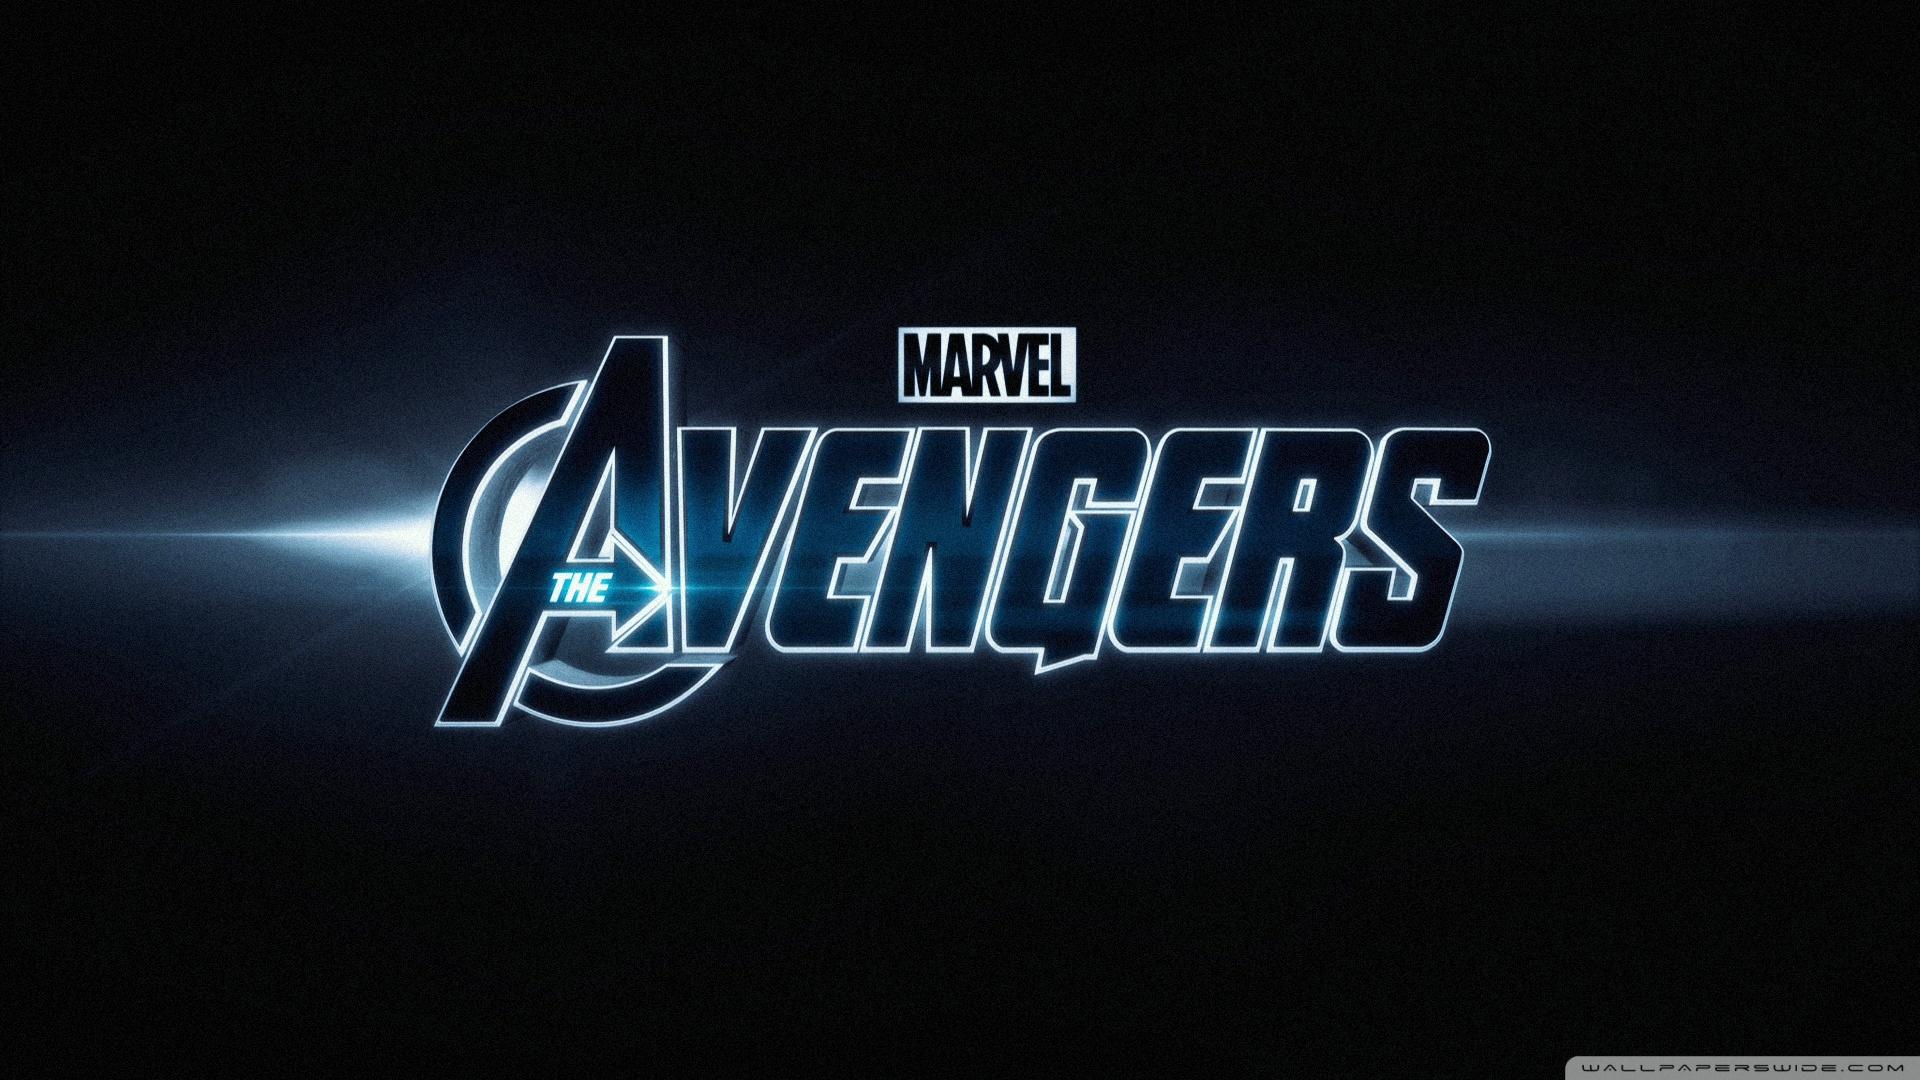 Avengers Wallpaper The Avengers Wallpapers HD Avengers Desktop 1920x1080